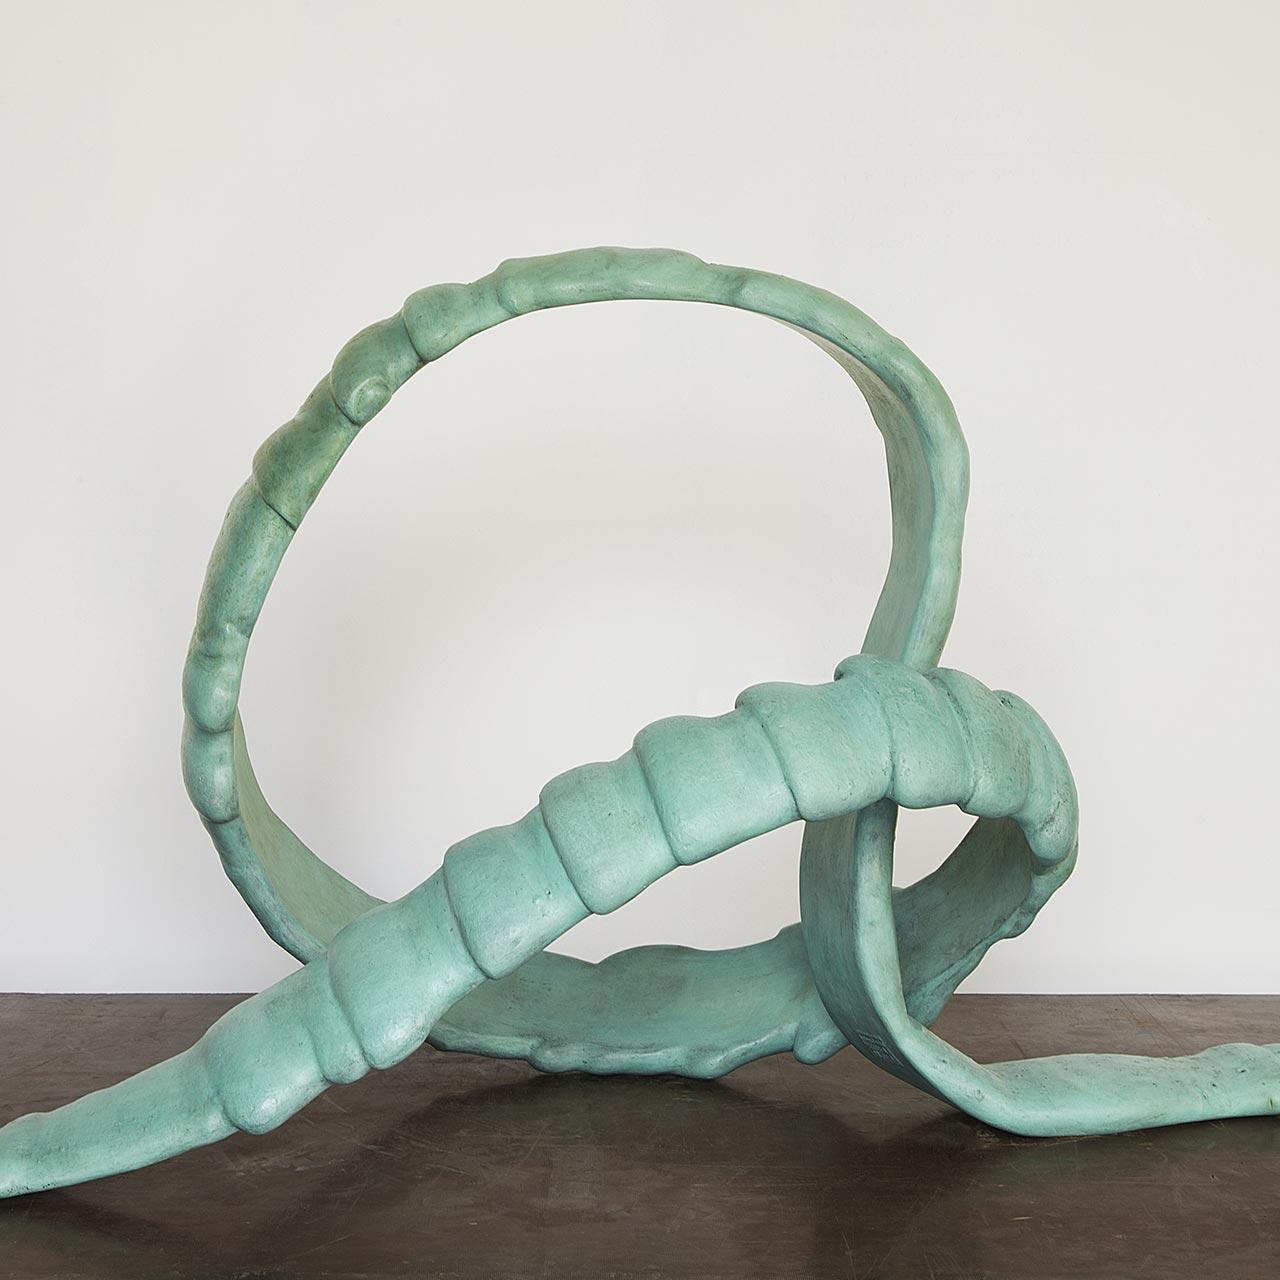 Battaglia Foundry Sculpture Prize #01